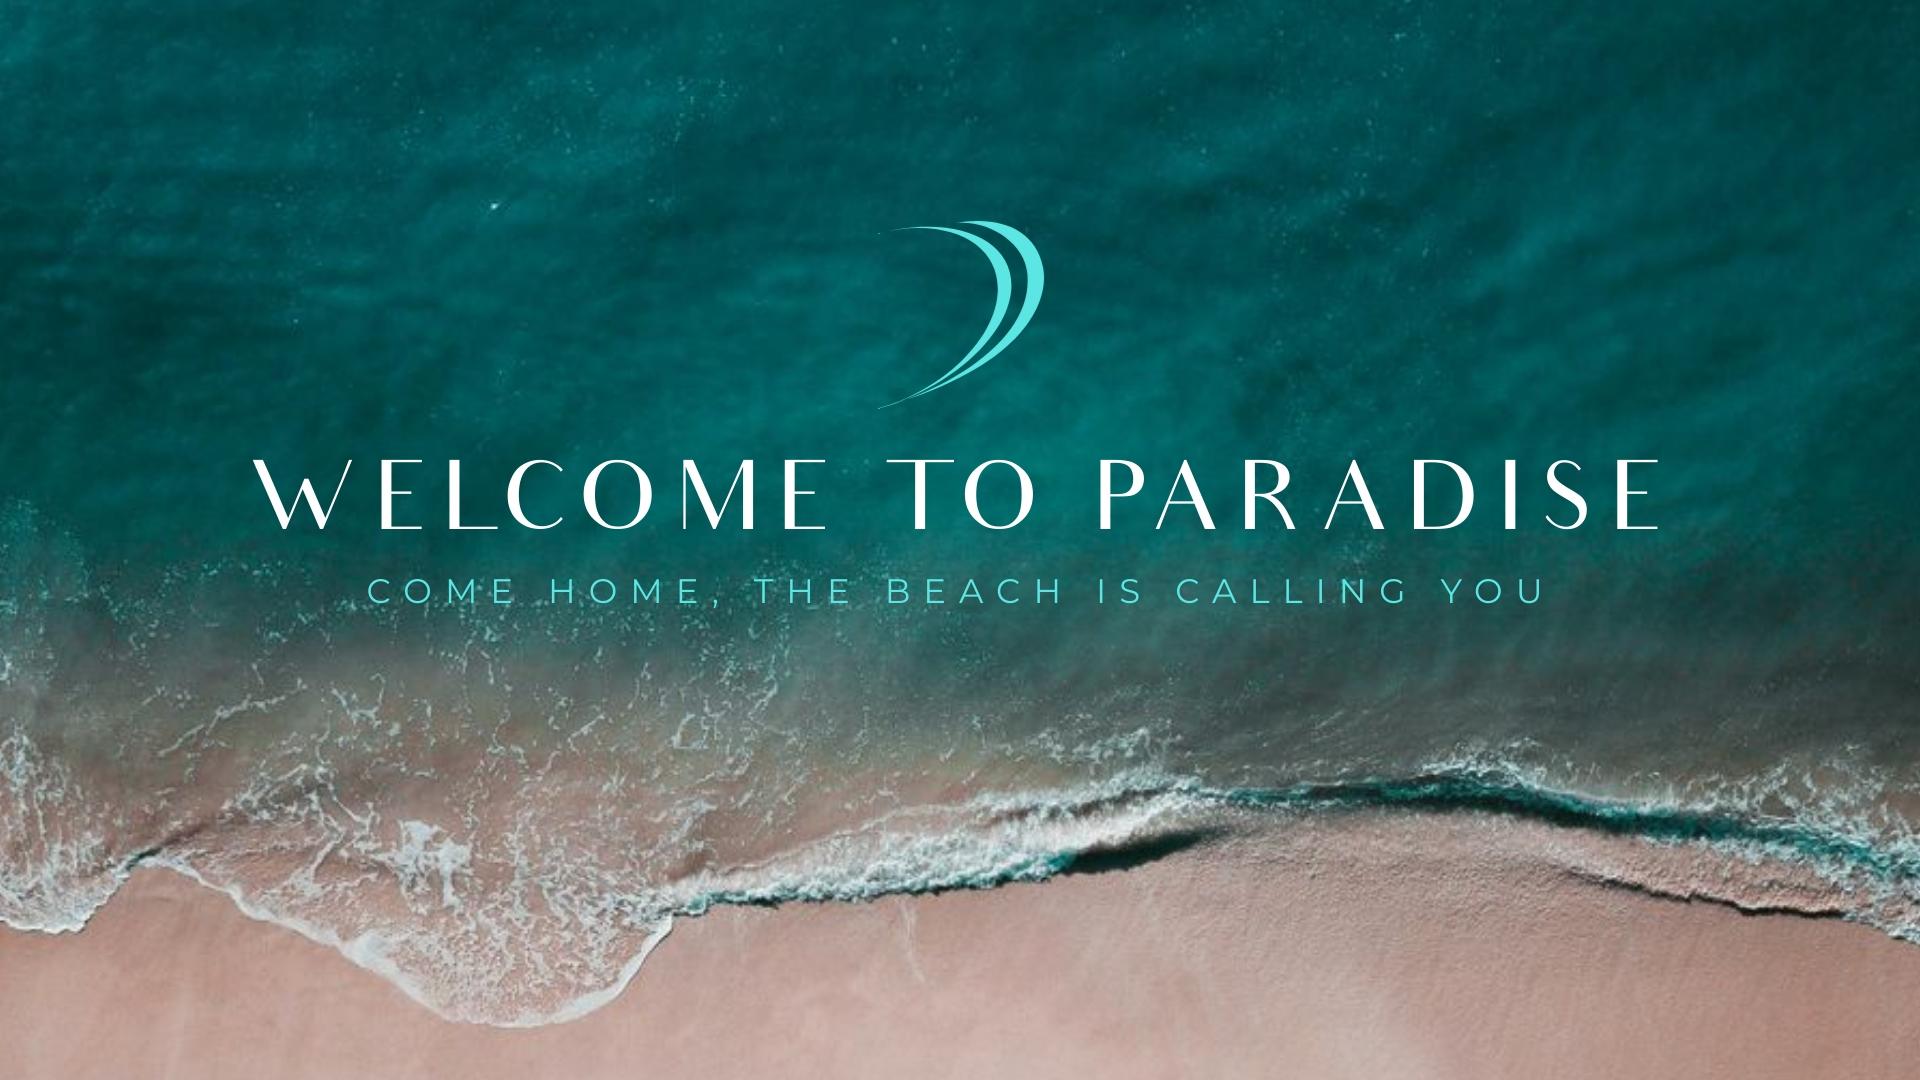 Beach Hotel Facebook Video Ad Template